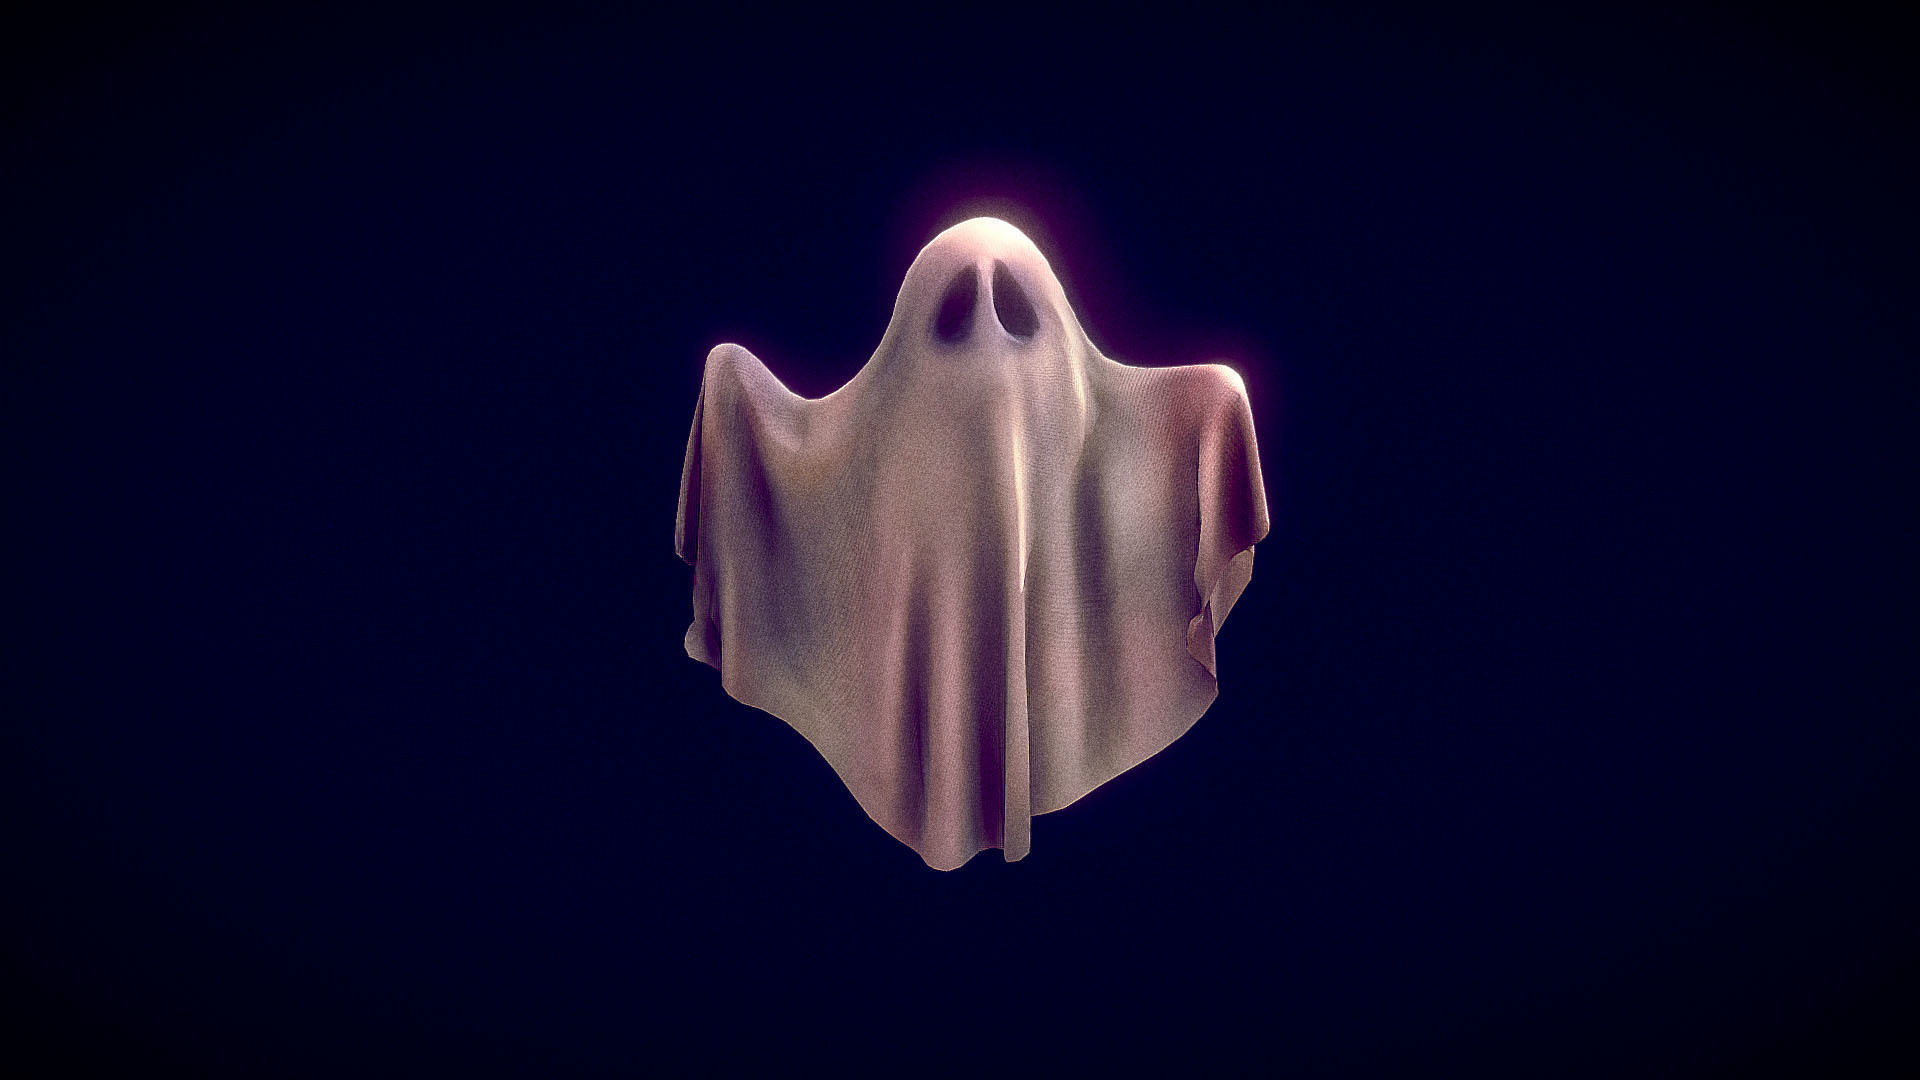 Ghost Toon